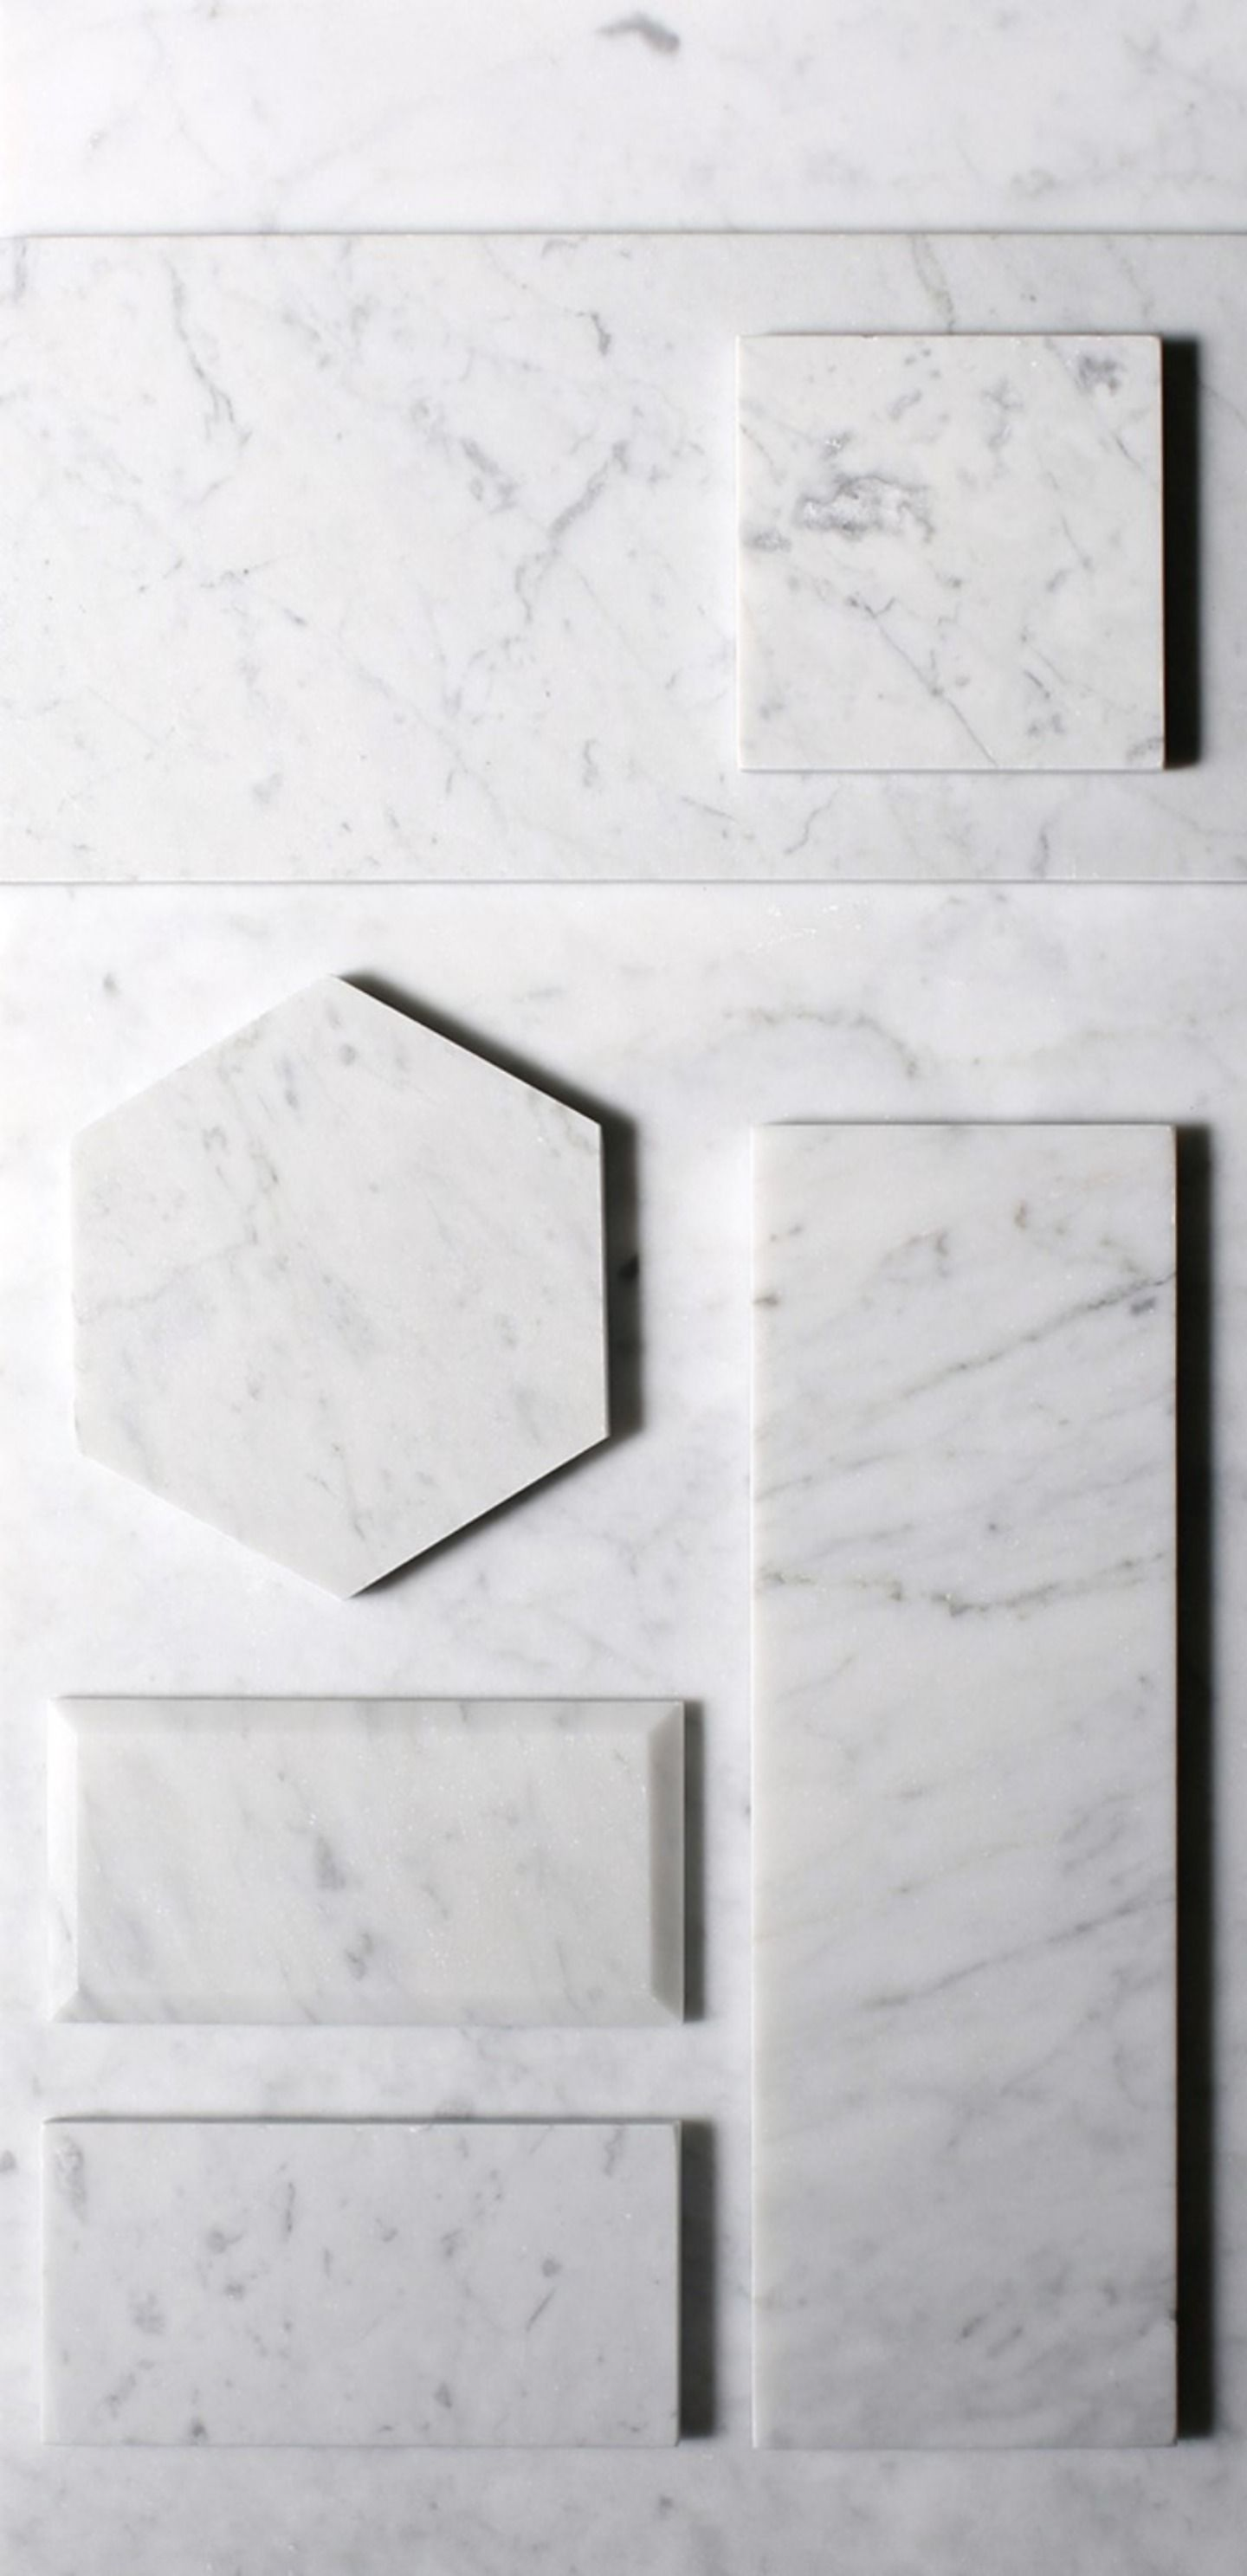 Cle Carrara 4 X4 X3 8 Square With Images Carrara Marble Tile Carrara Tiles Marble Wall Tiles